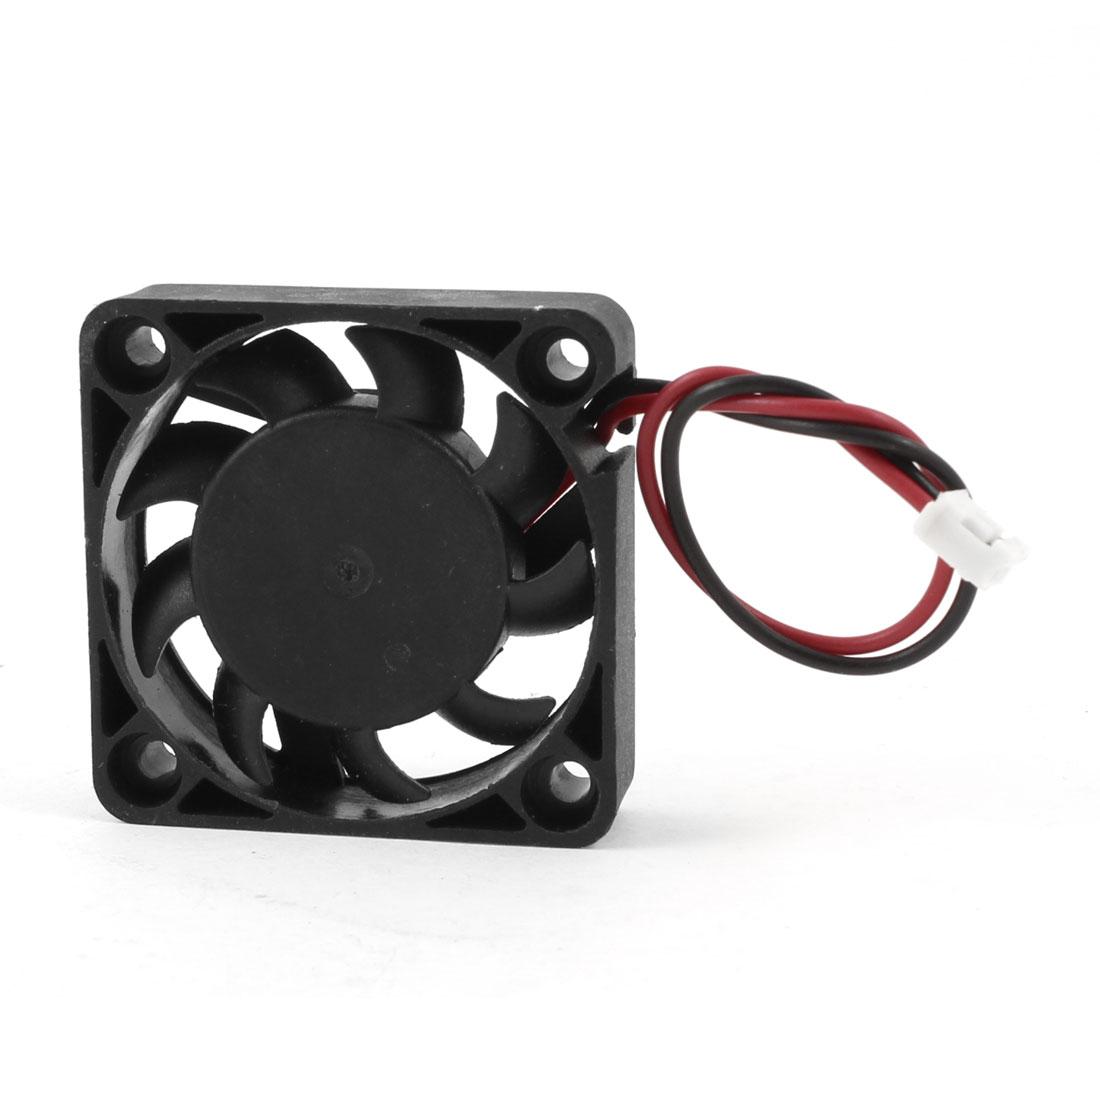 DC 12V 0.10A PC Computer Desktop CPU Cooler Cooling Fan Connector